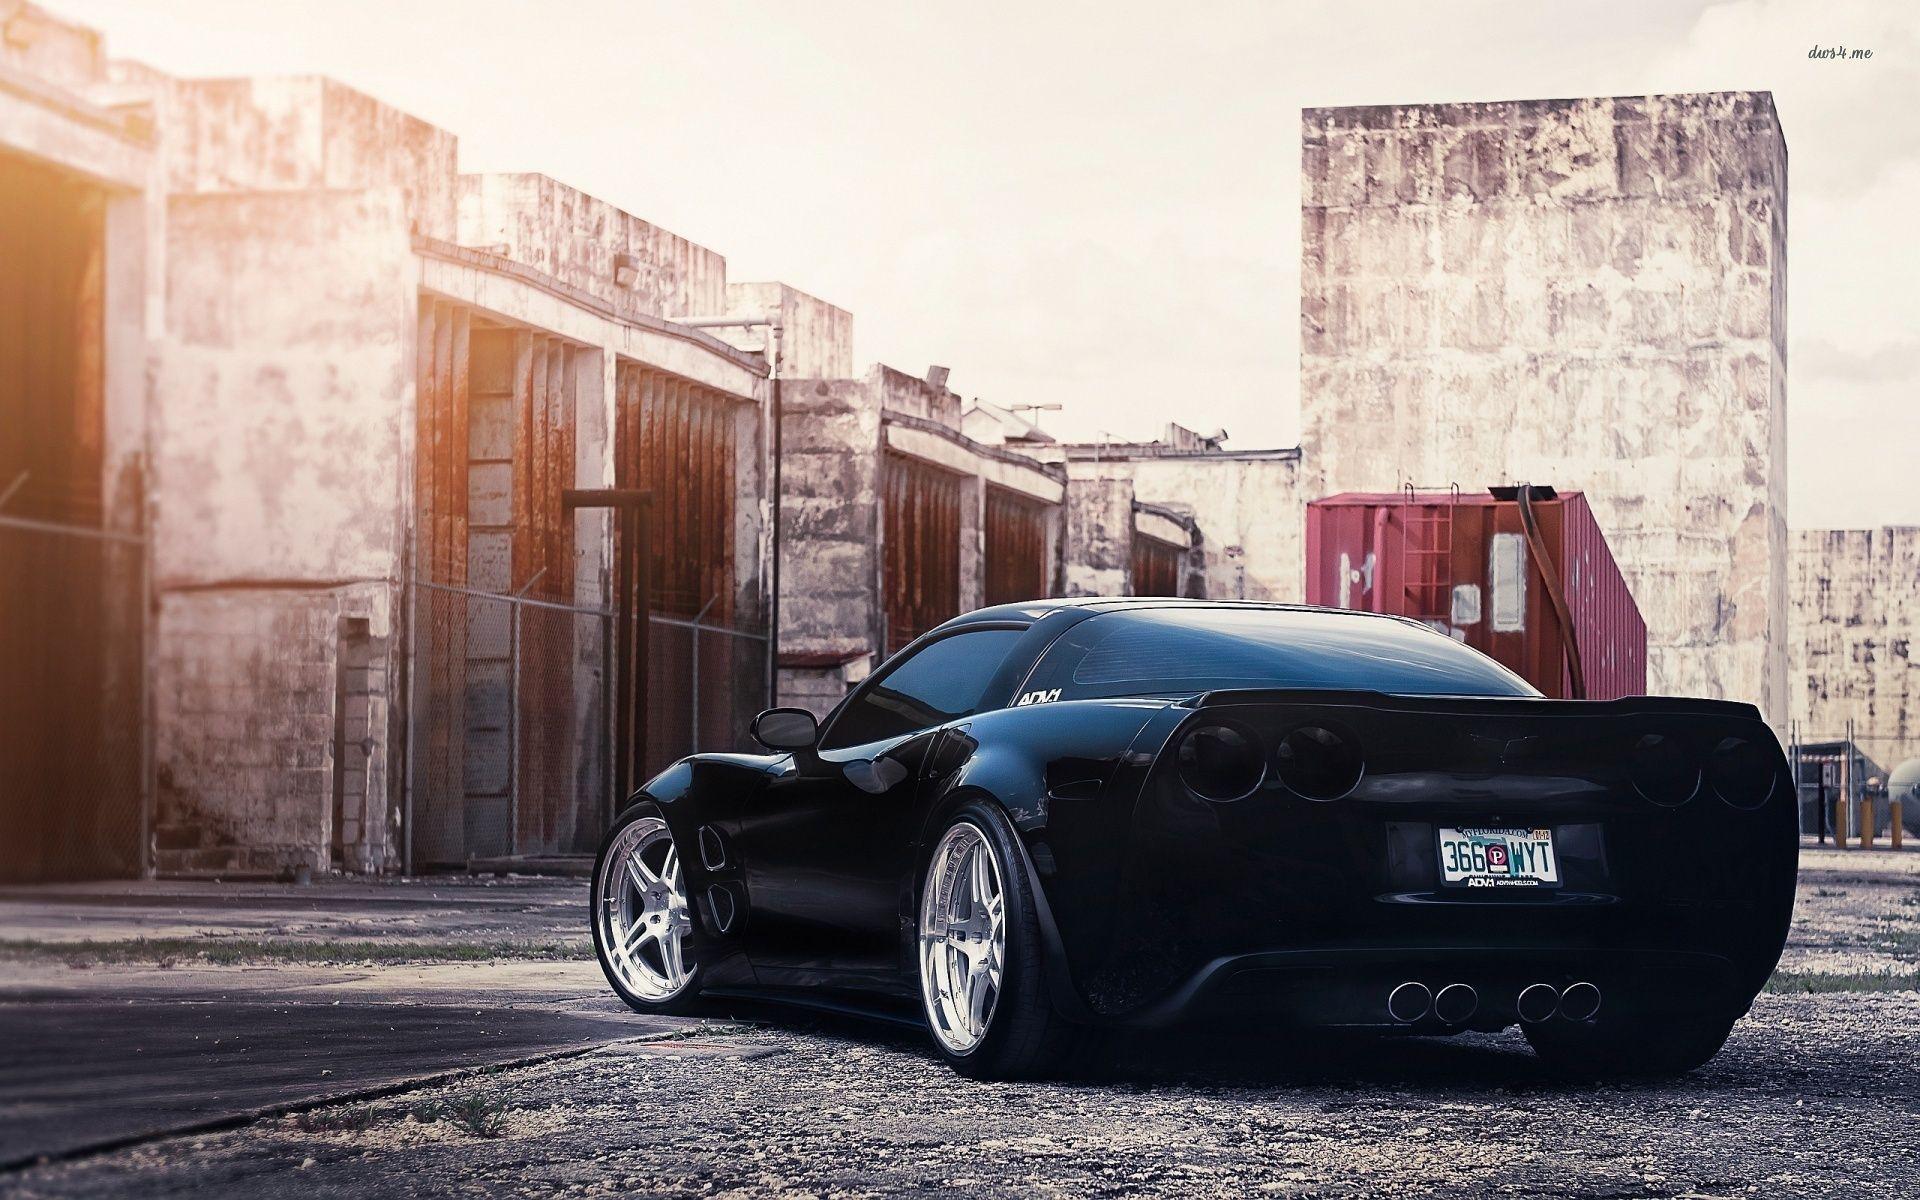 black corvette zr1 wallpapers - photo #6